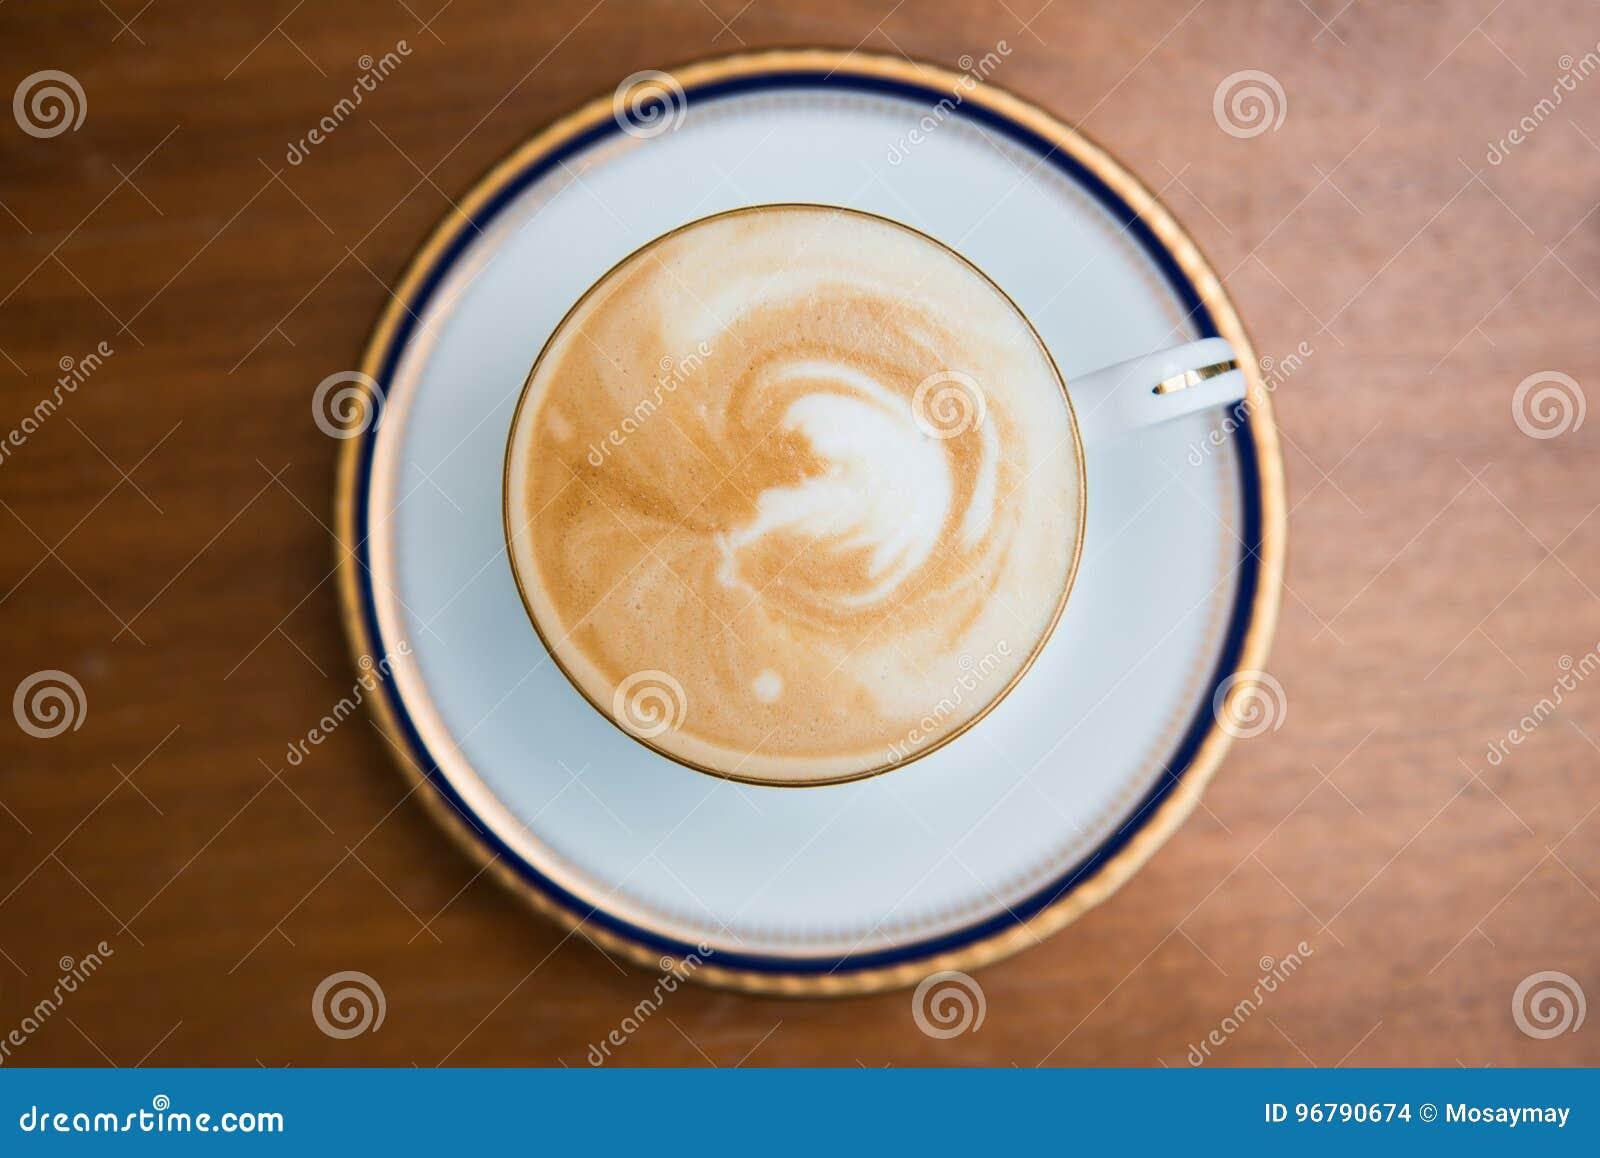 Cup of mocha with milk foam in,cafe